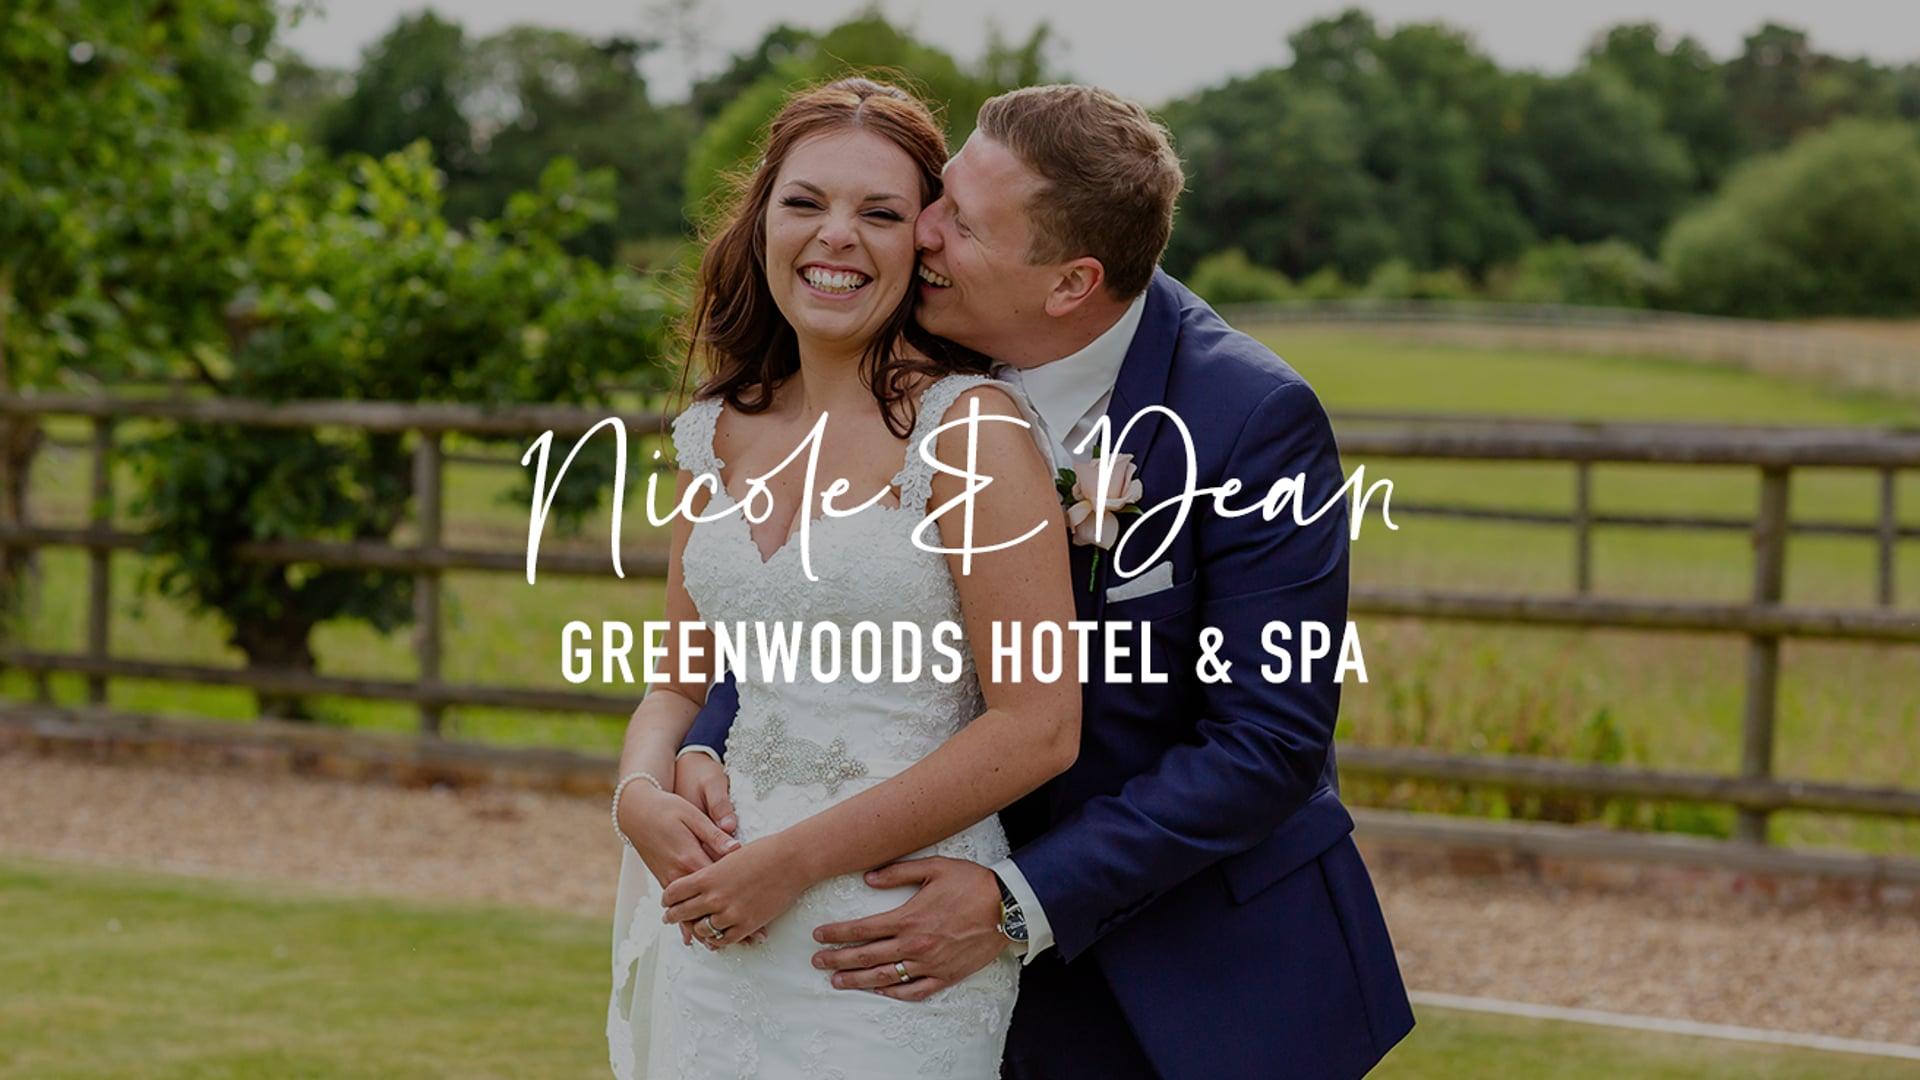 Nicole & Dean - Greenwoods Hotel & Spa